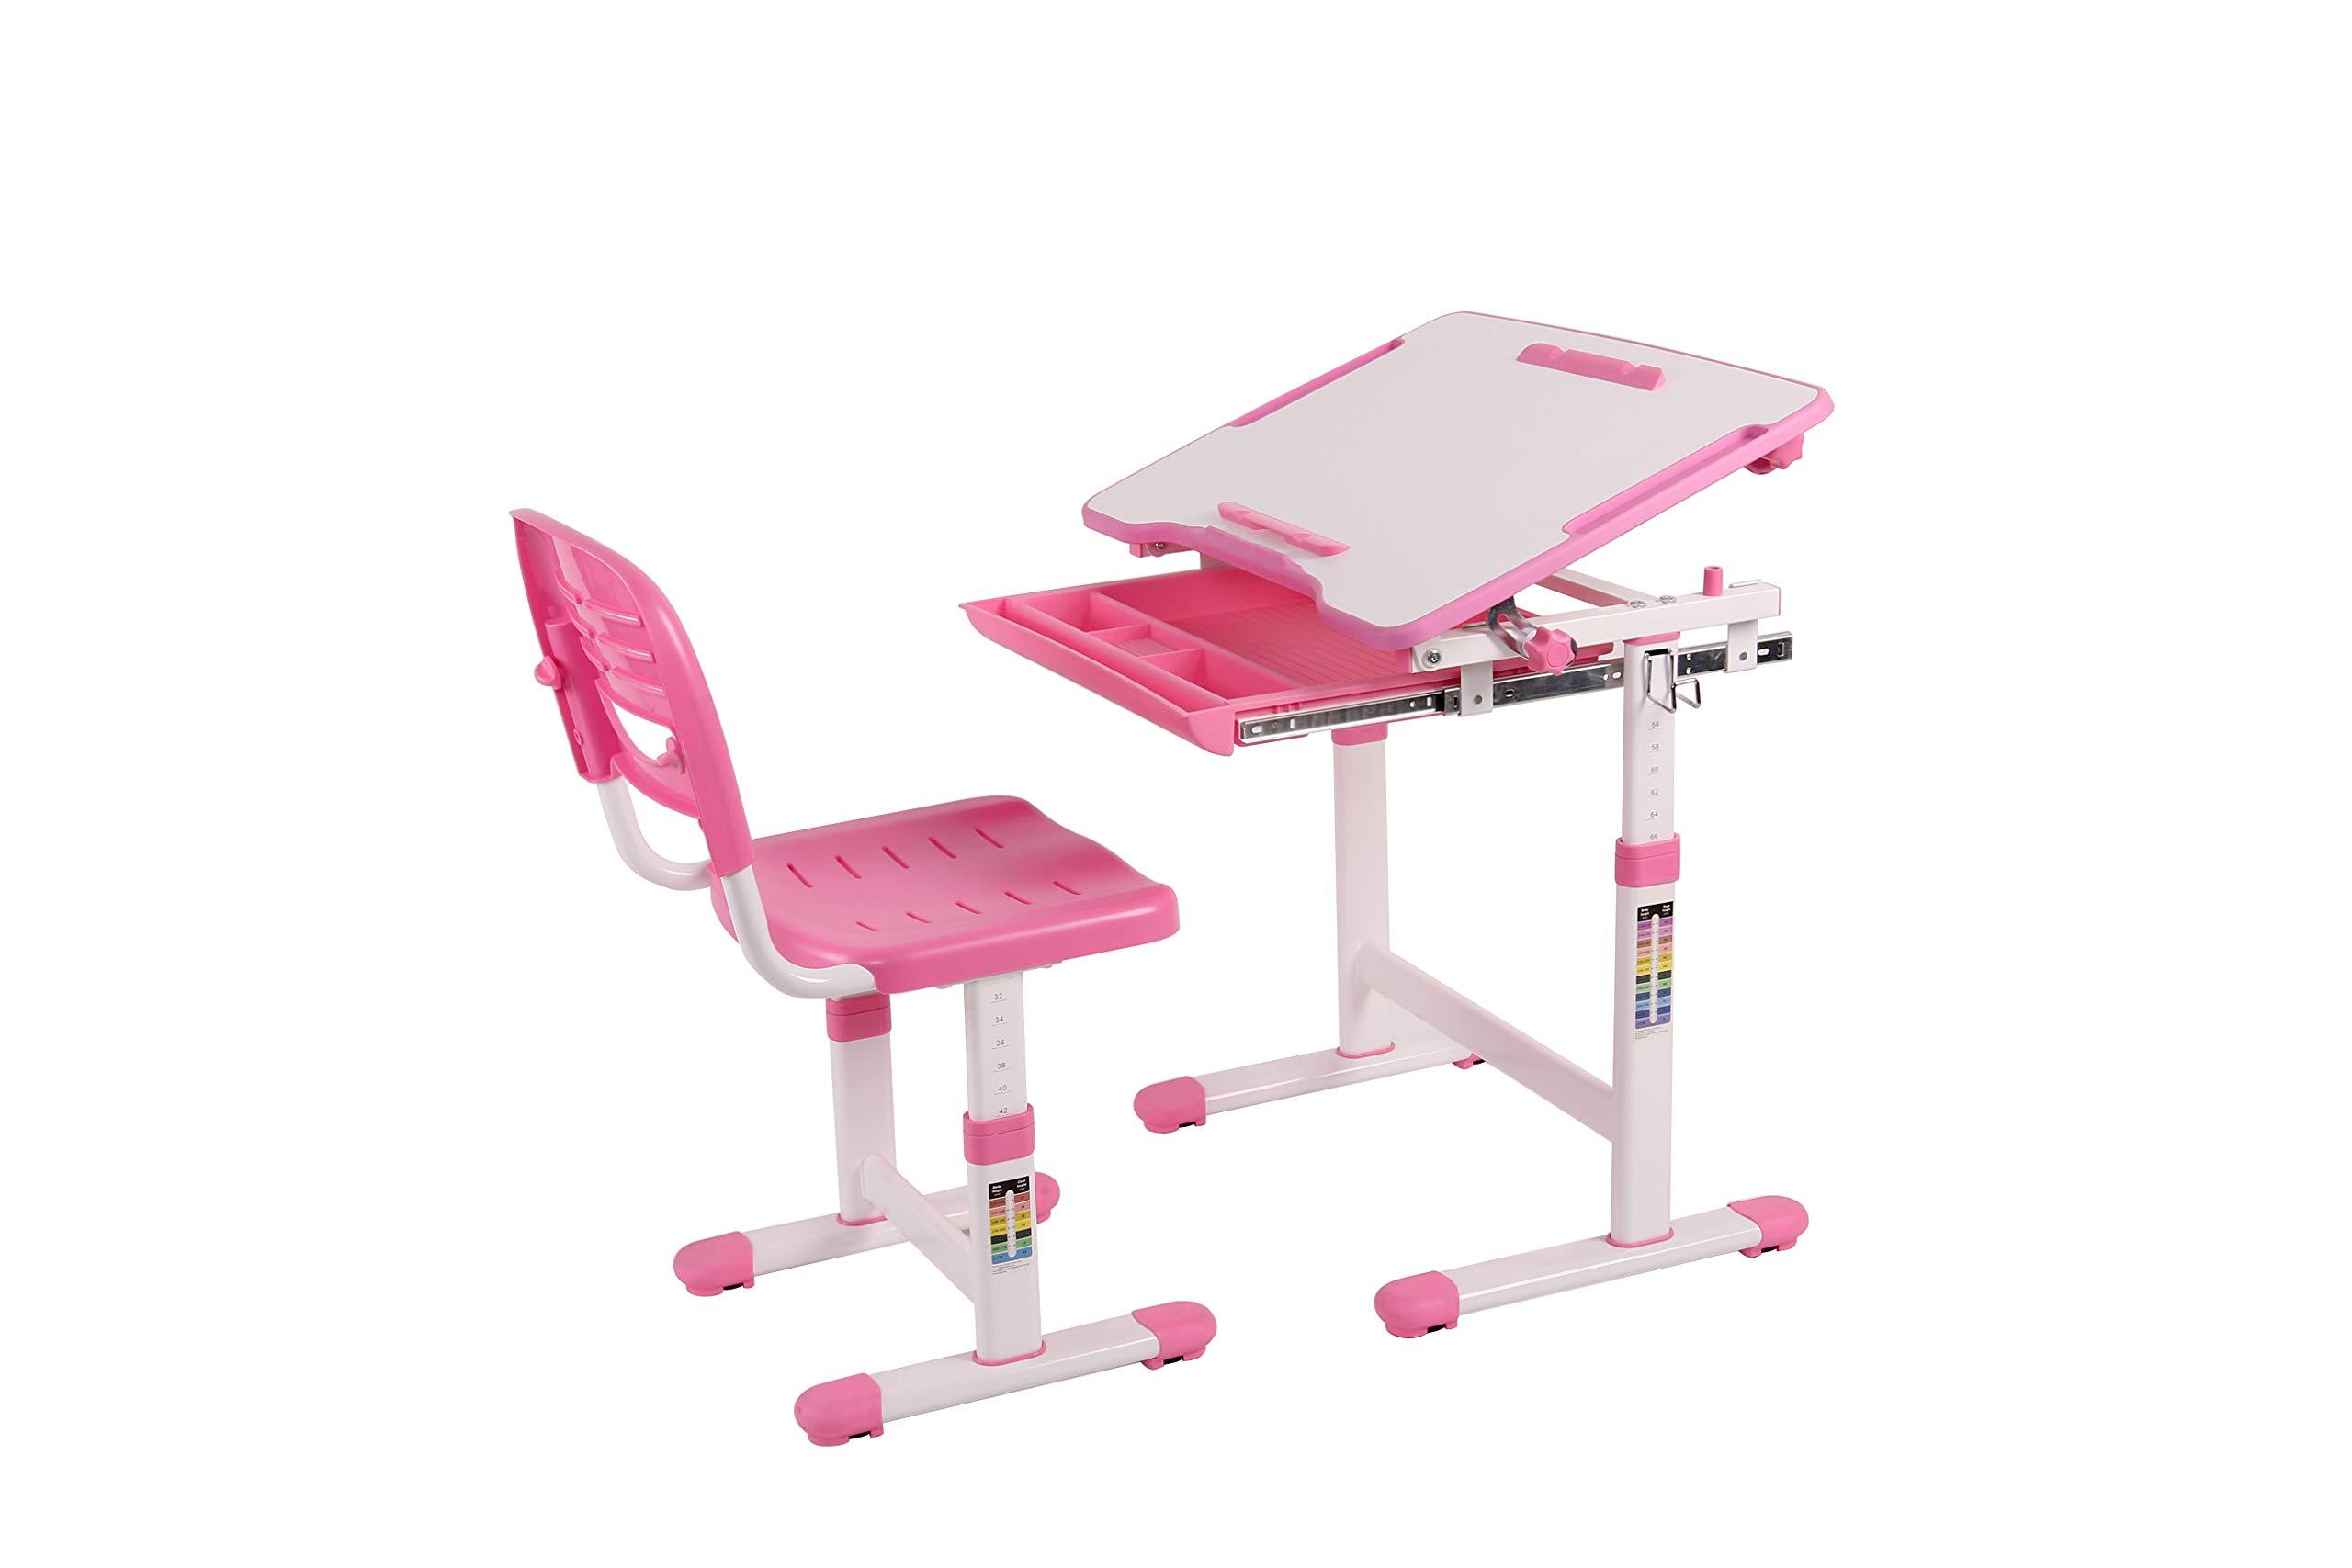 Wymo Kids Ergonomic Adjustable Childrens Desk & Chair With Drawing Paper Roll (Pink) by Wymo Kidz